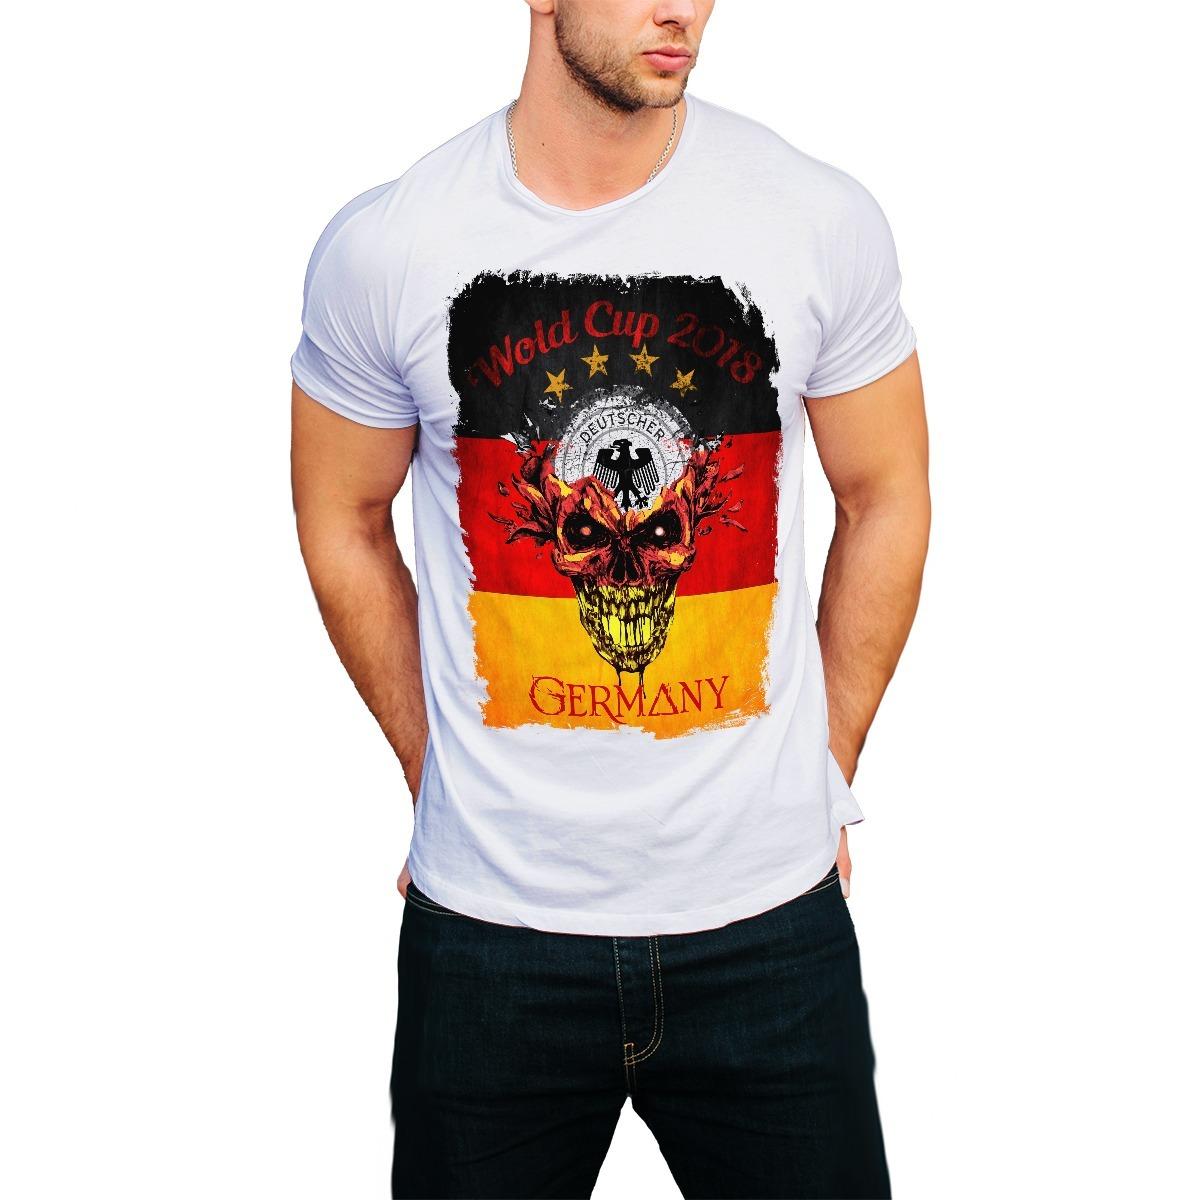 3b7c3f9b77b01 camiseta futebol alemanha camisa copa mundo 2018 russia top. Carregando  zoom.